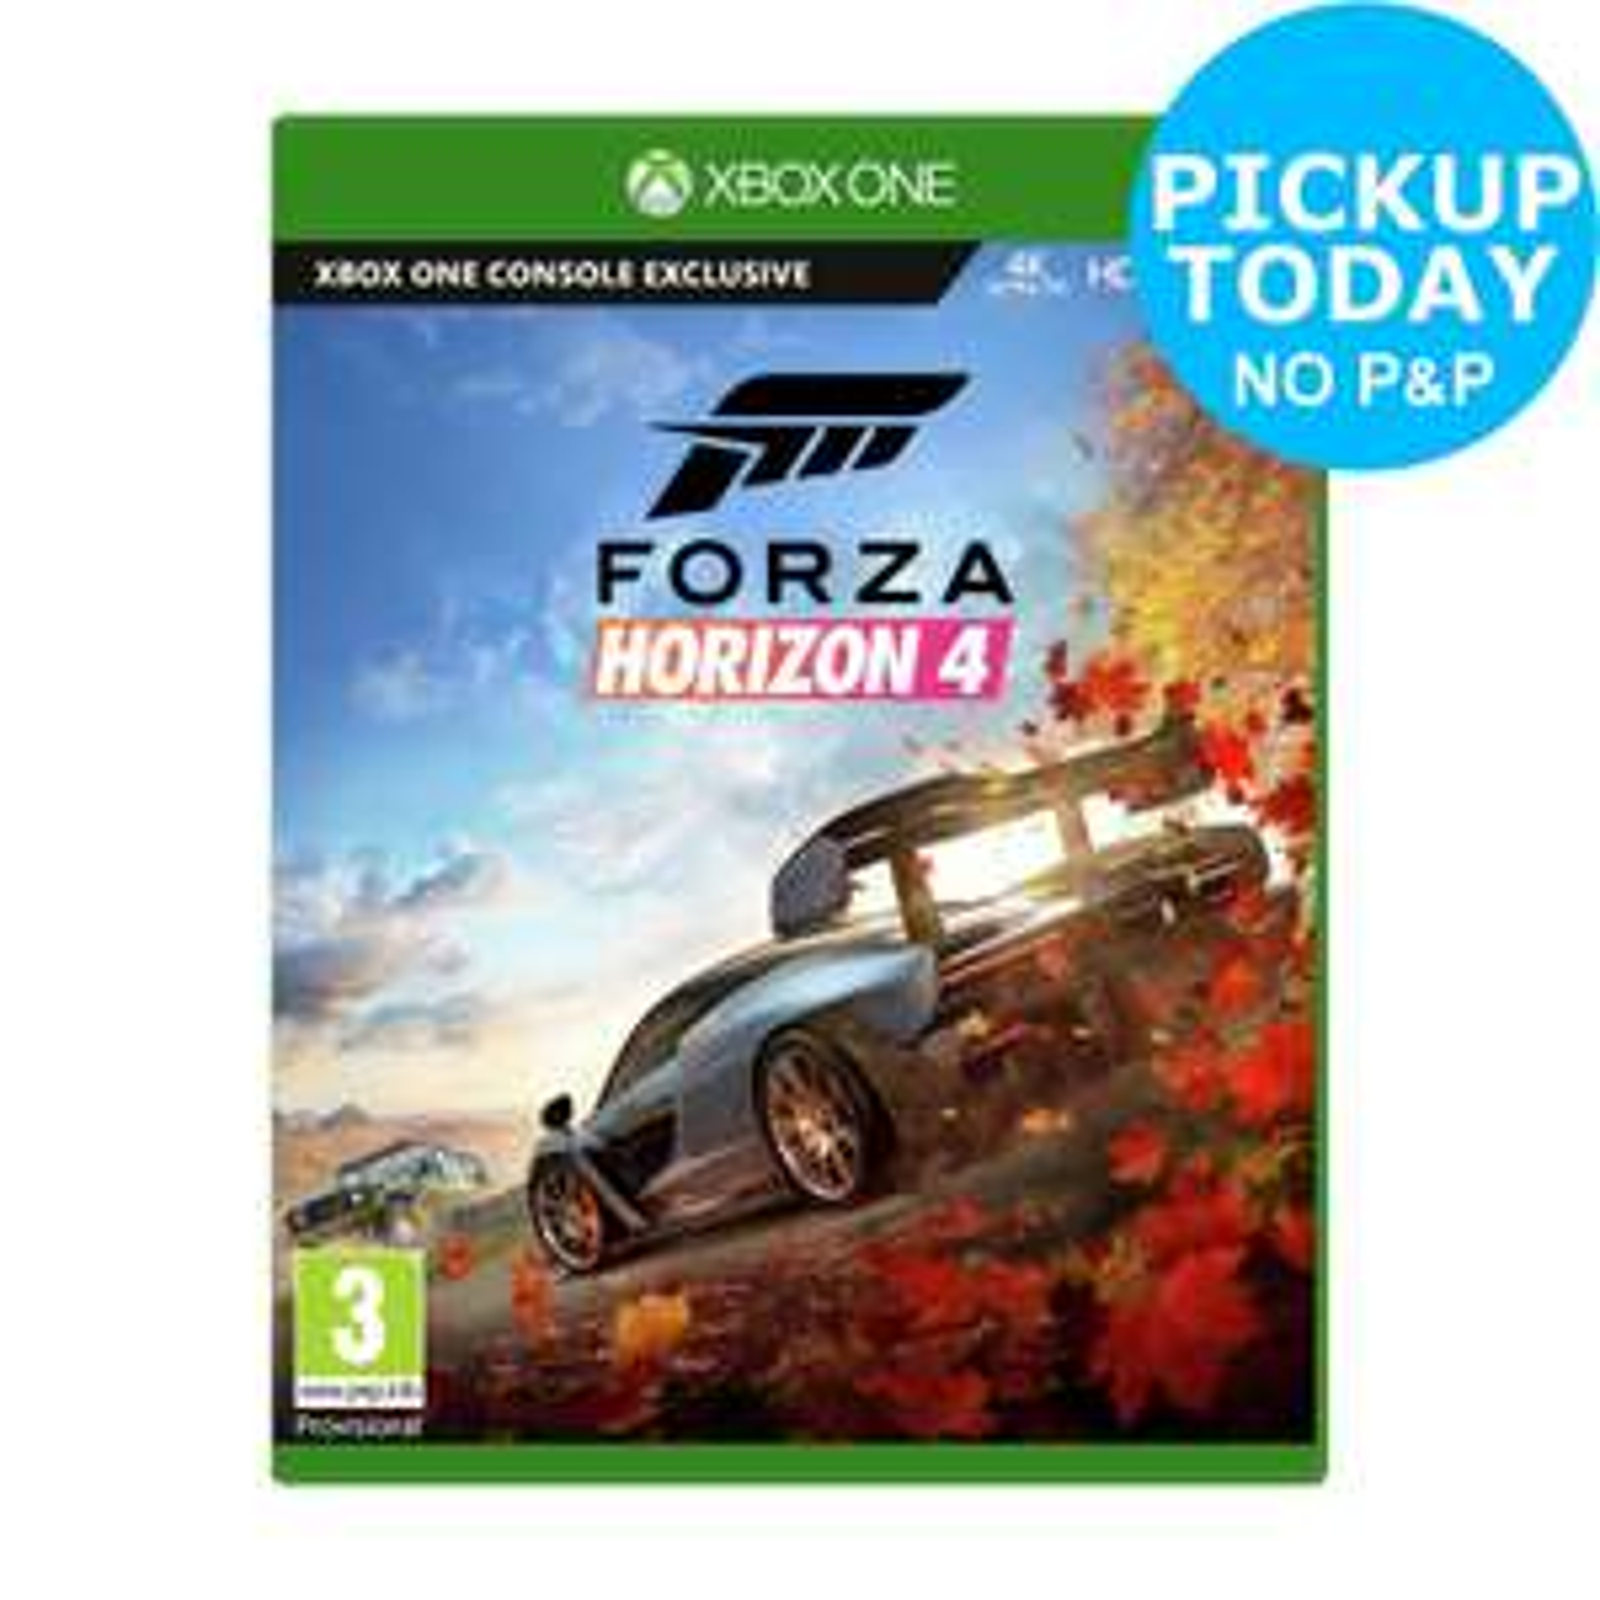 Forza Horizon 4 (Xbox One) for £21.24 w/code @ Argos eBay (Free C&C)